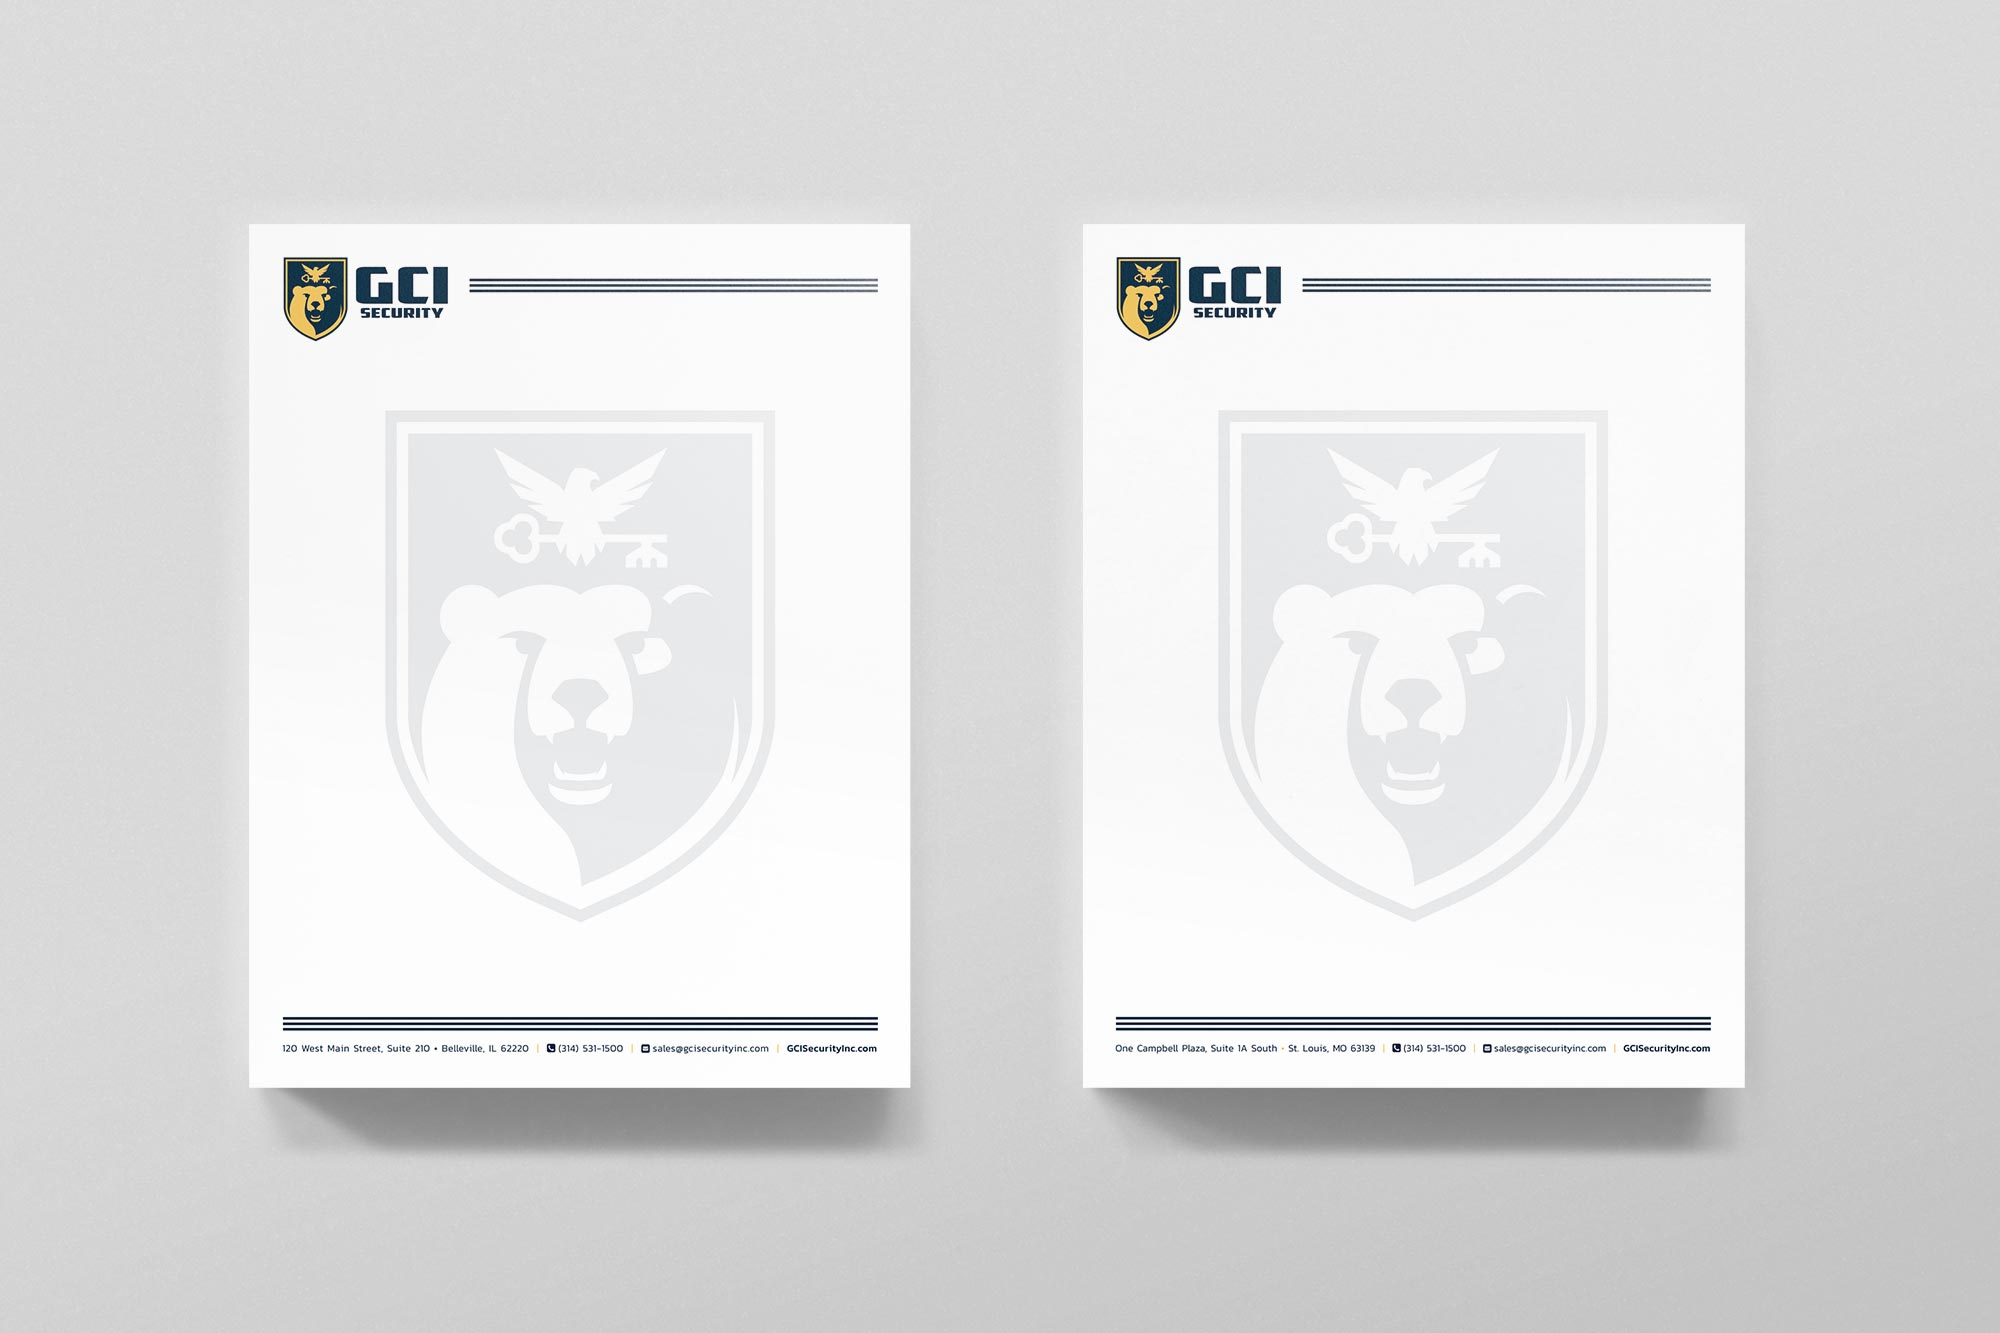 GCI Letterhead Design